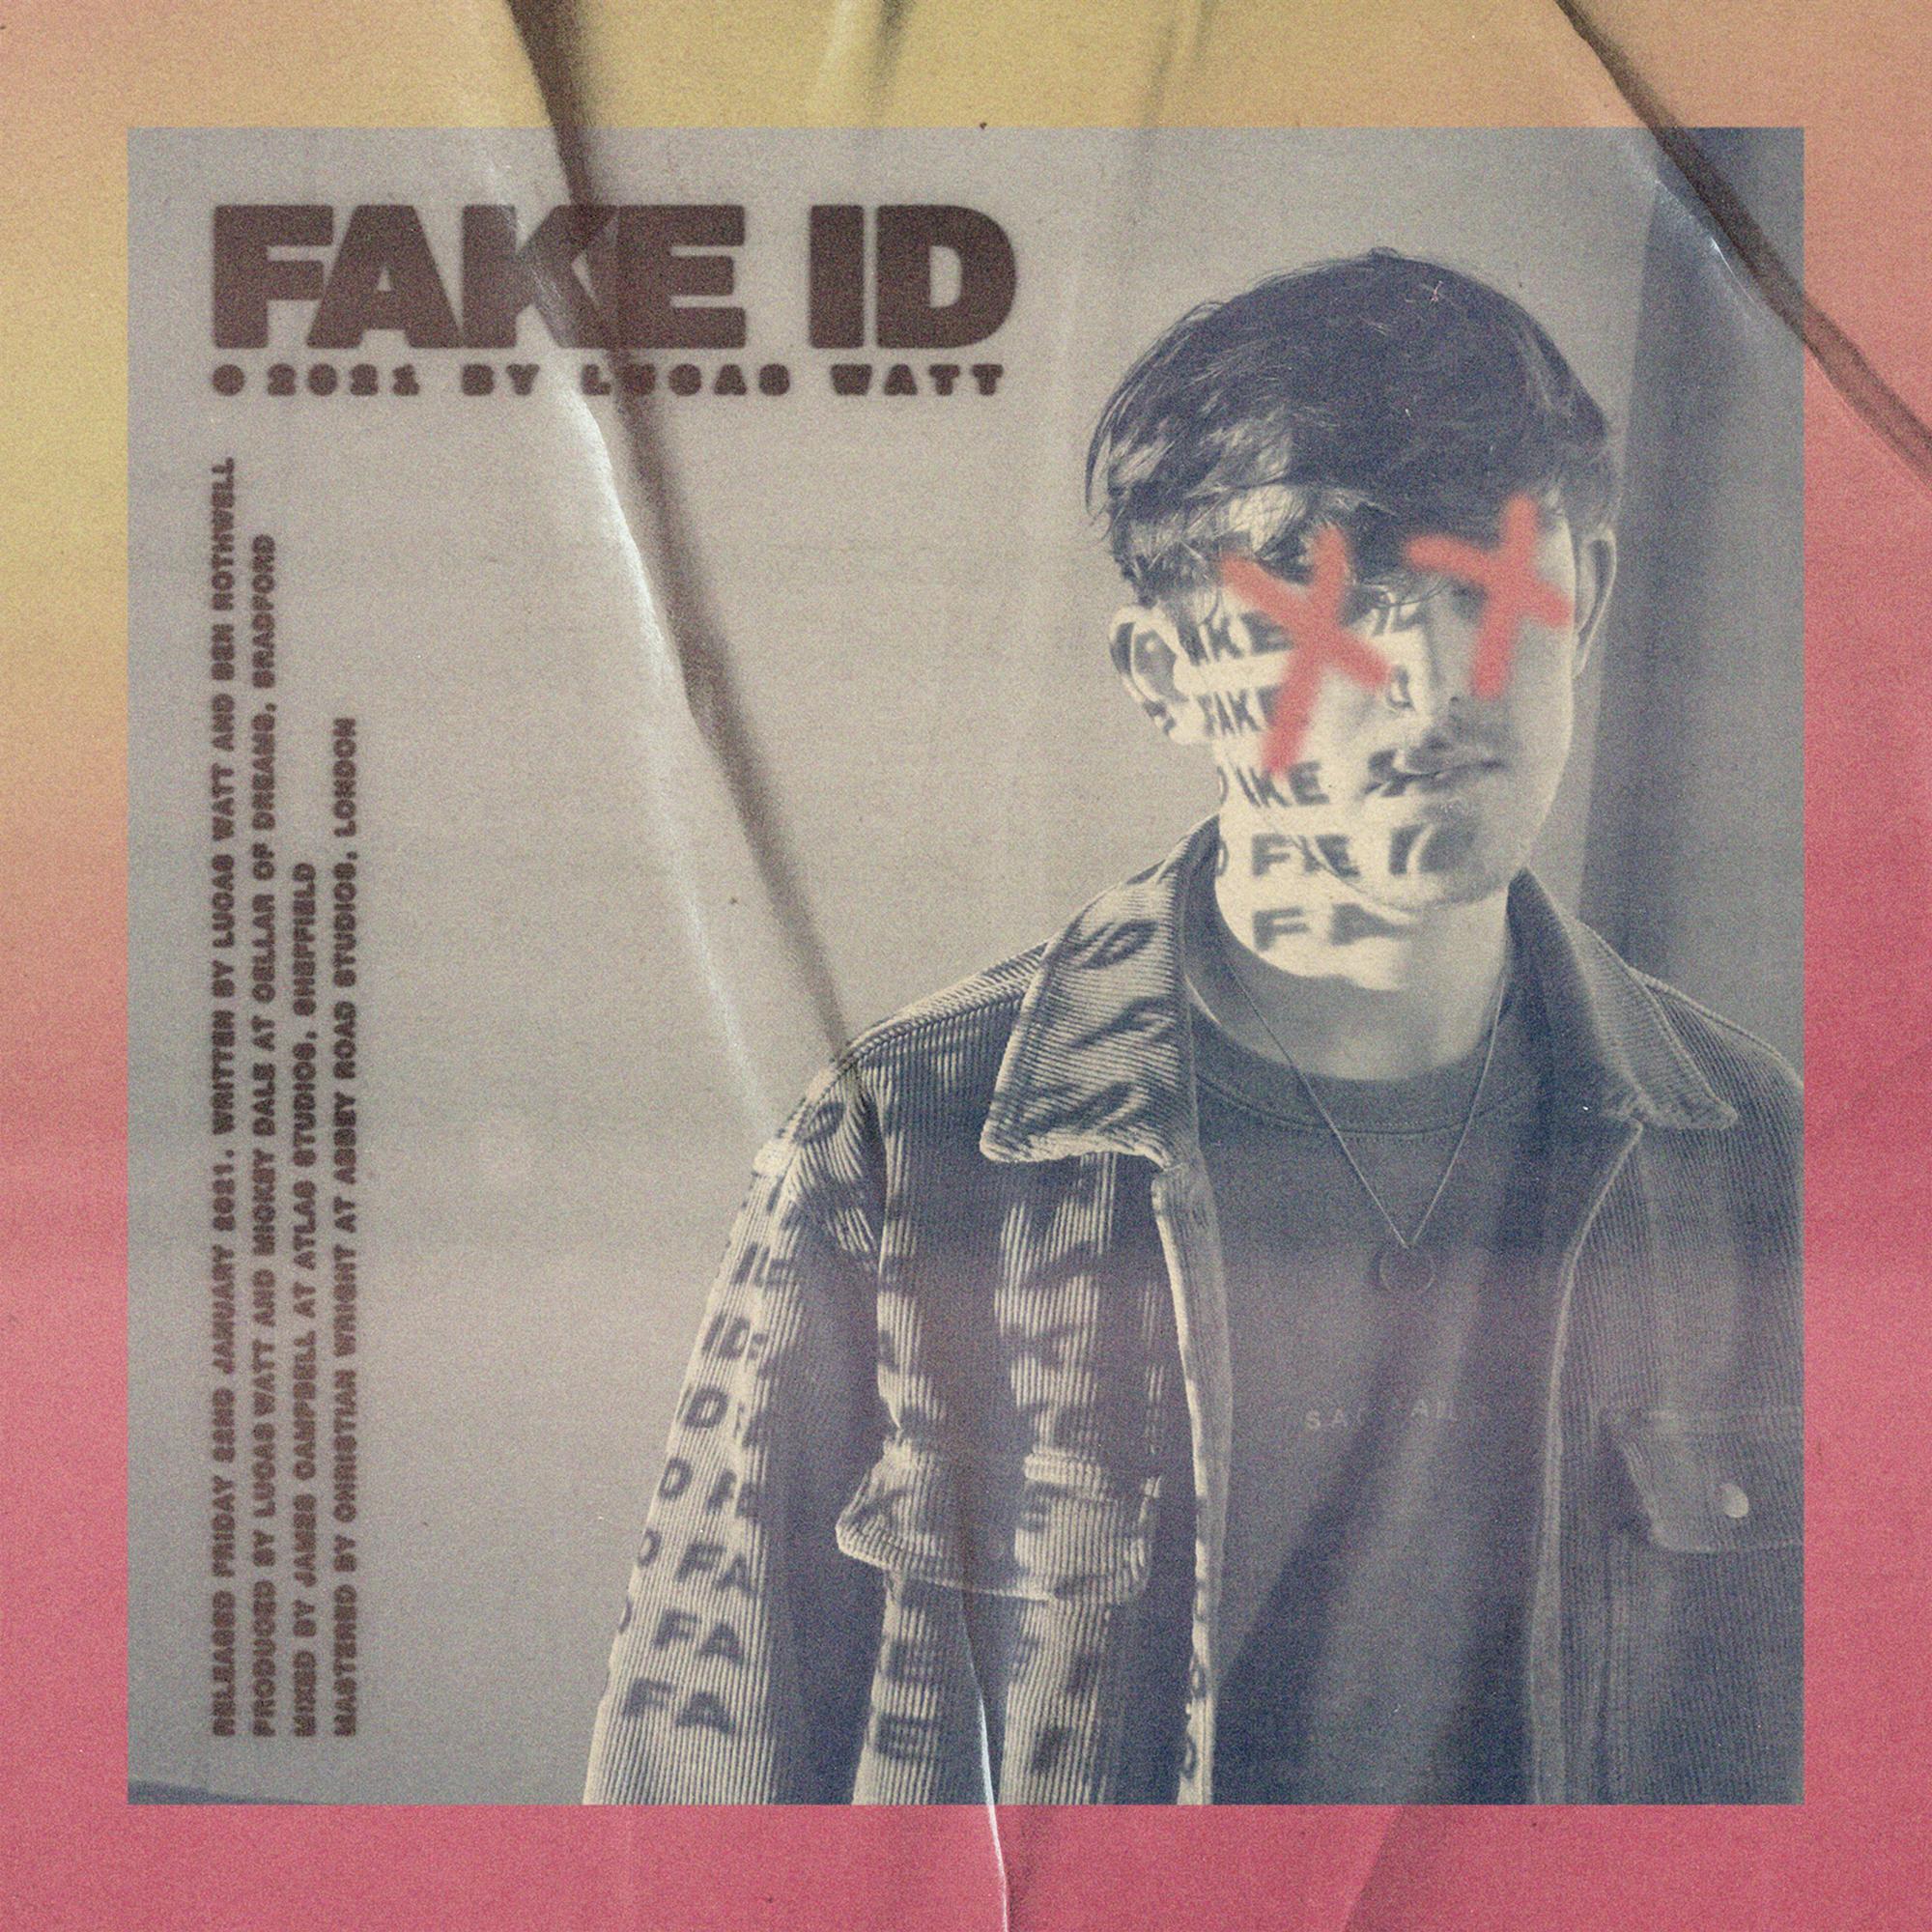 NEW: 'Fake ID' – Lucas Watt